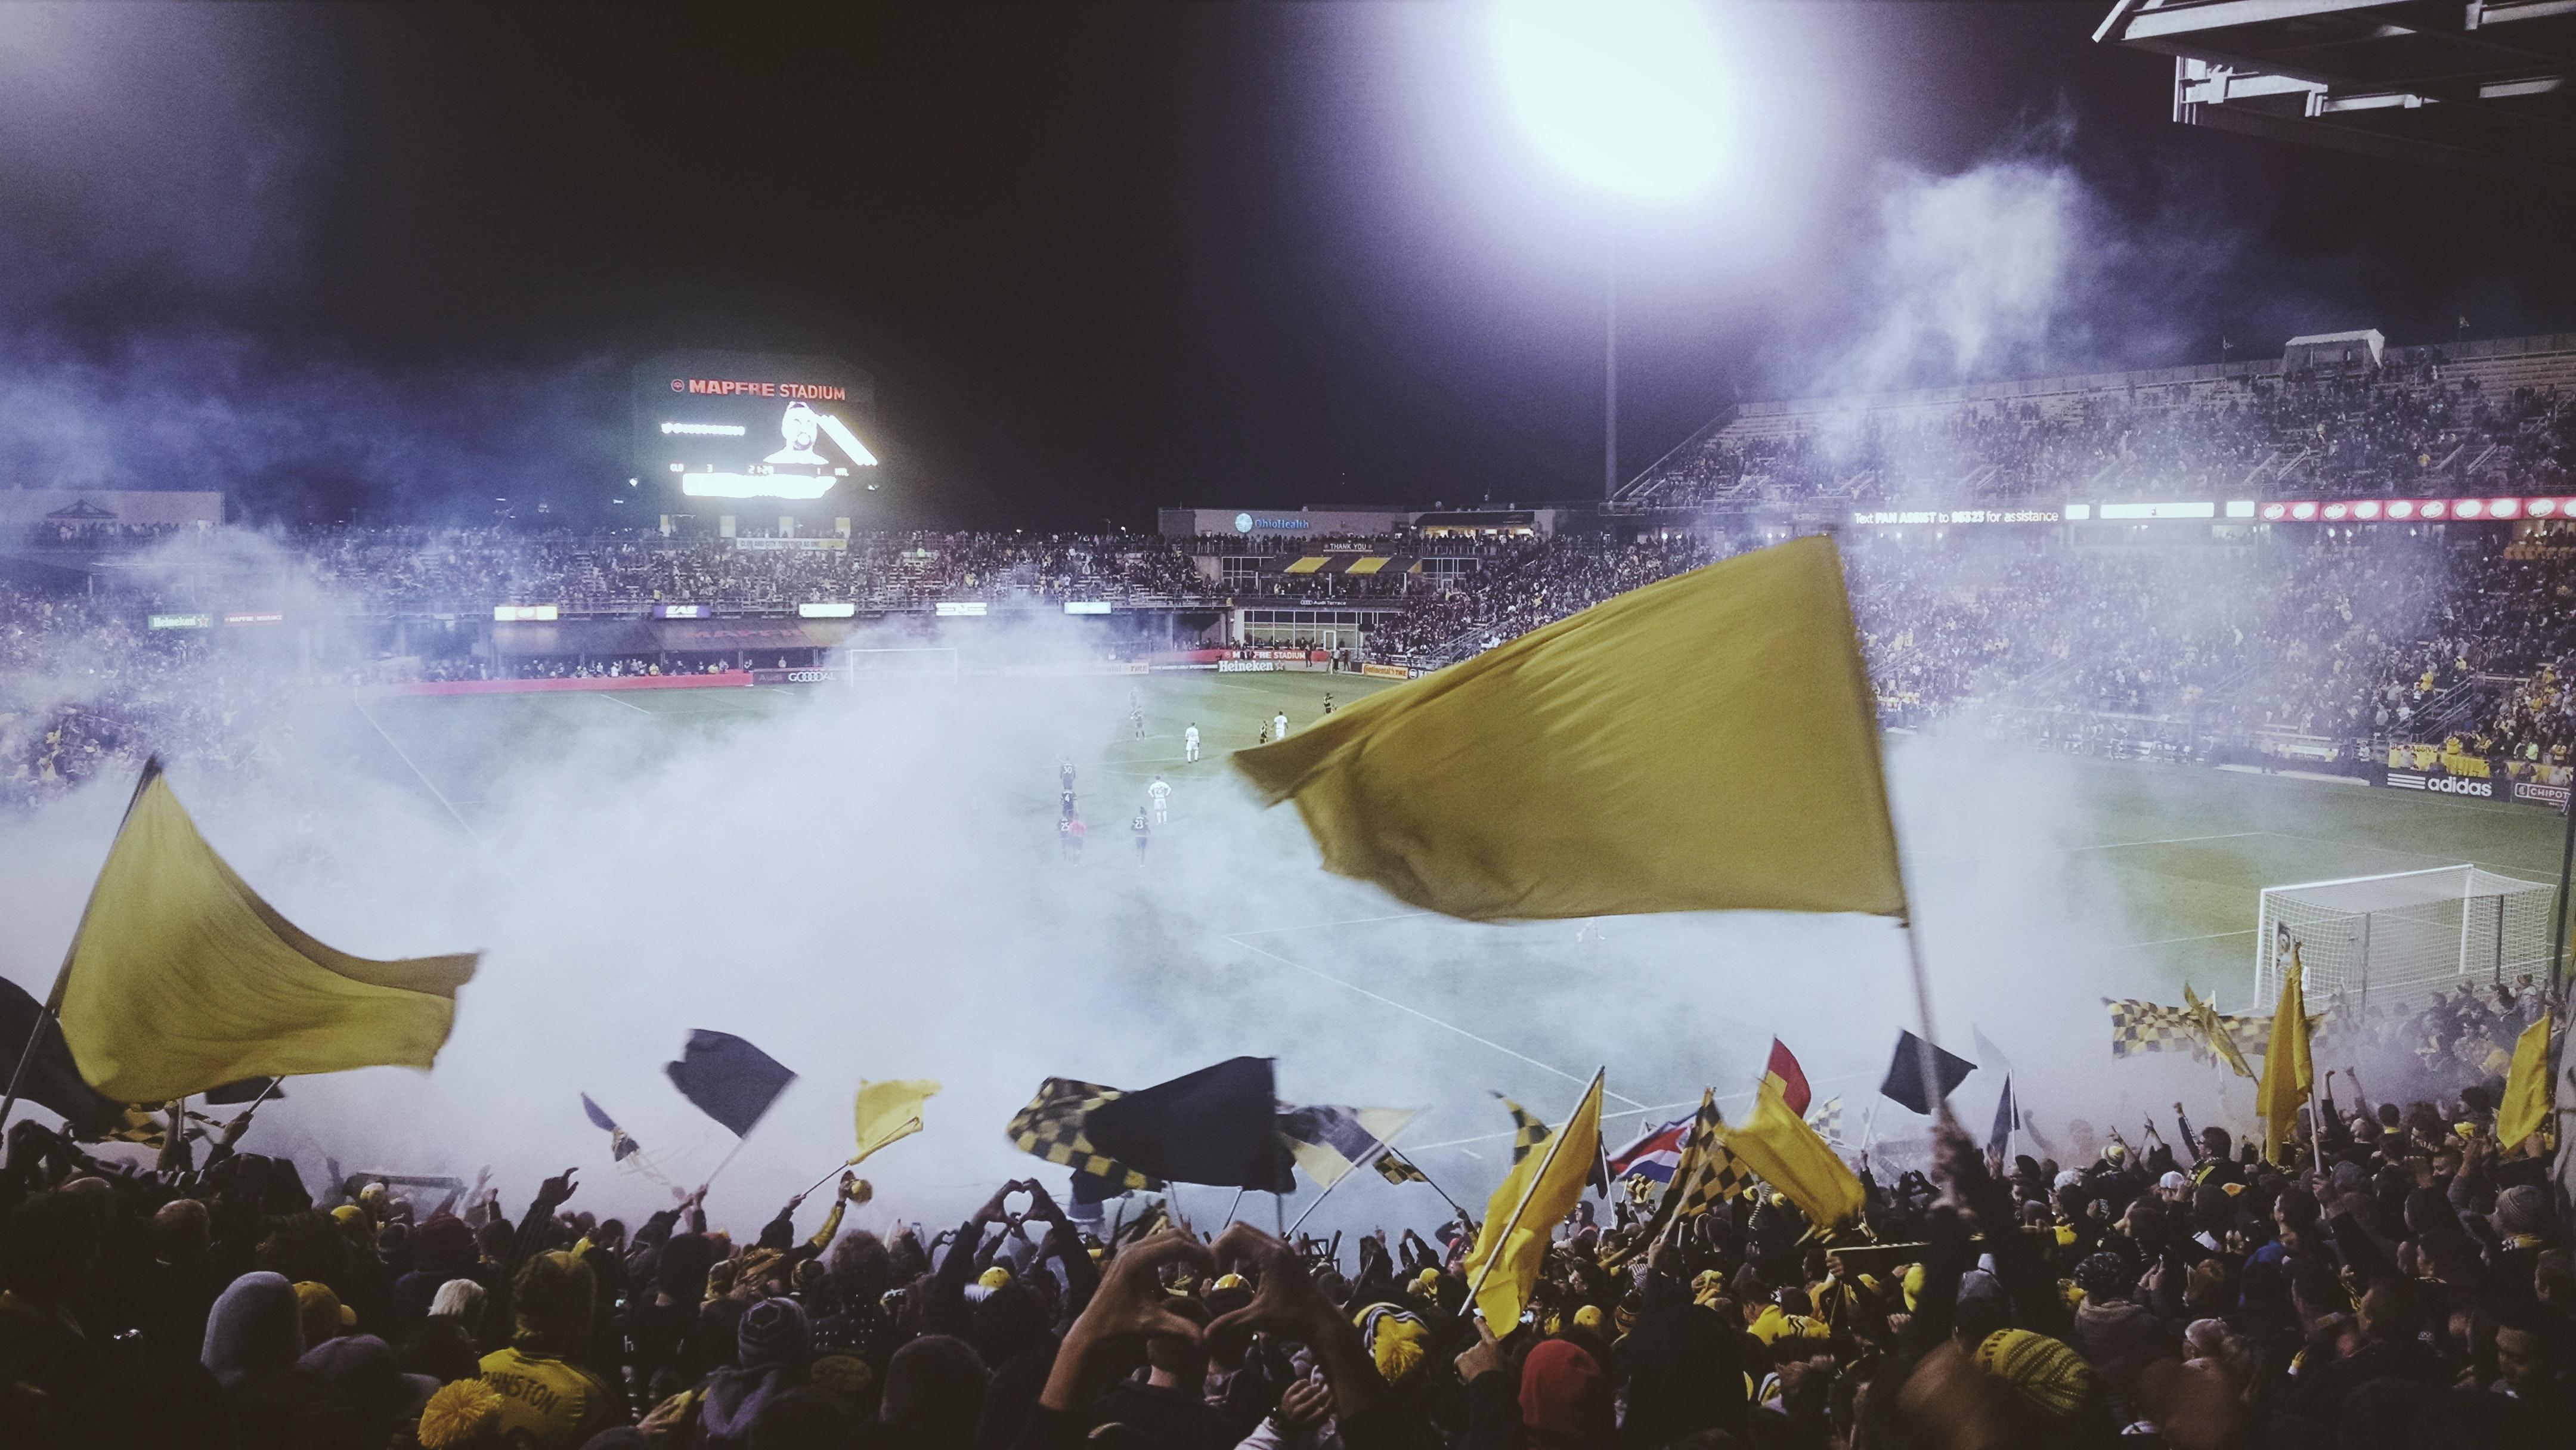 cheering-crowd-event-17598.jpg